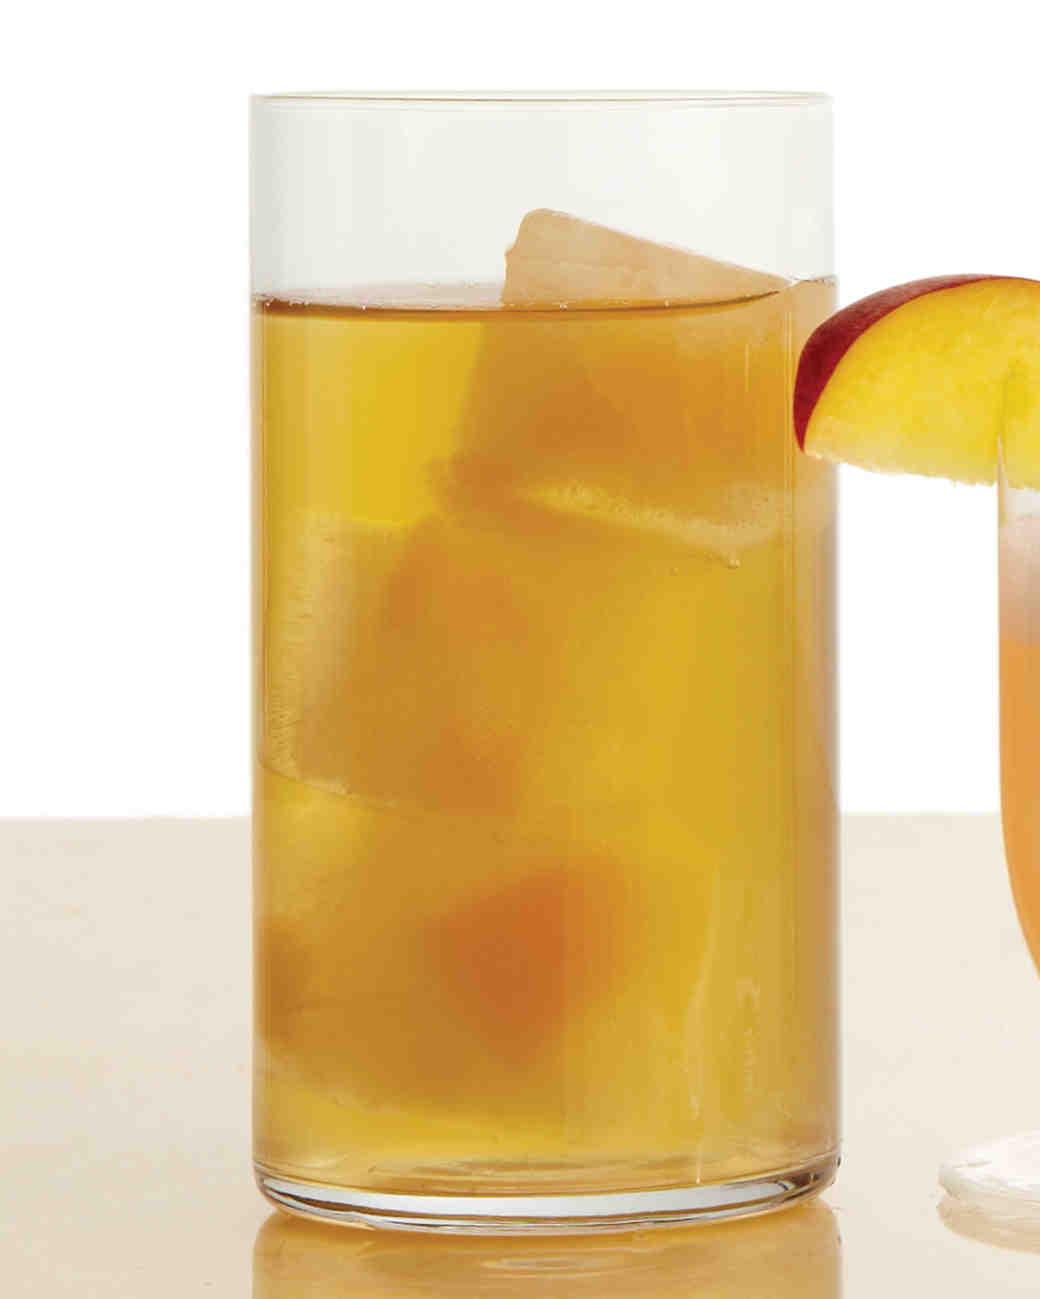 wedding-mocktail-recipes-mwd107050-white-peach-iced-tea-su11-0915.jpg